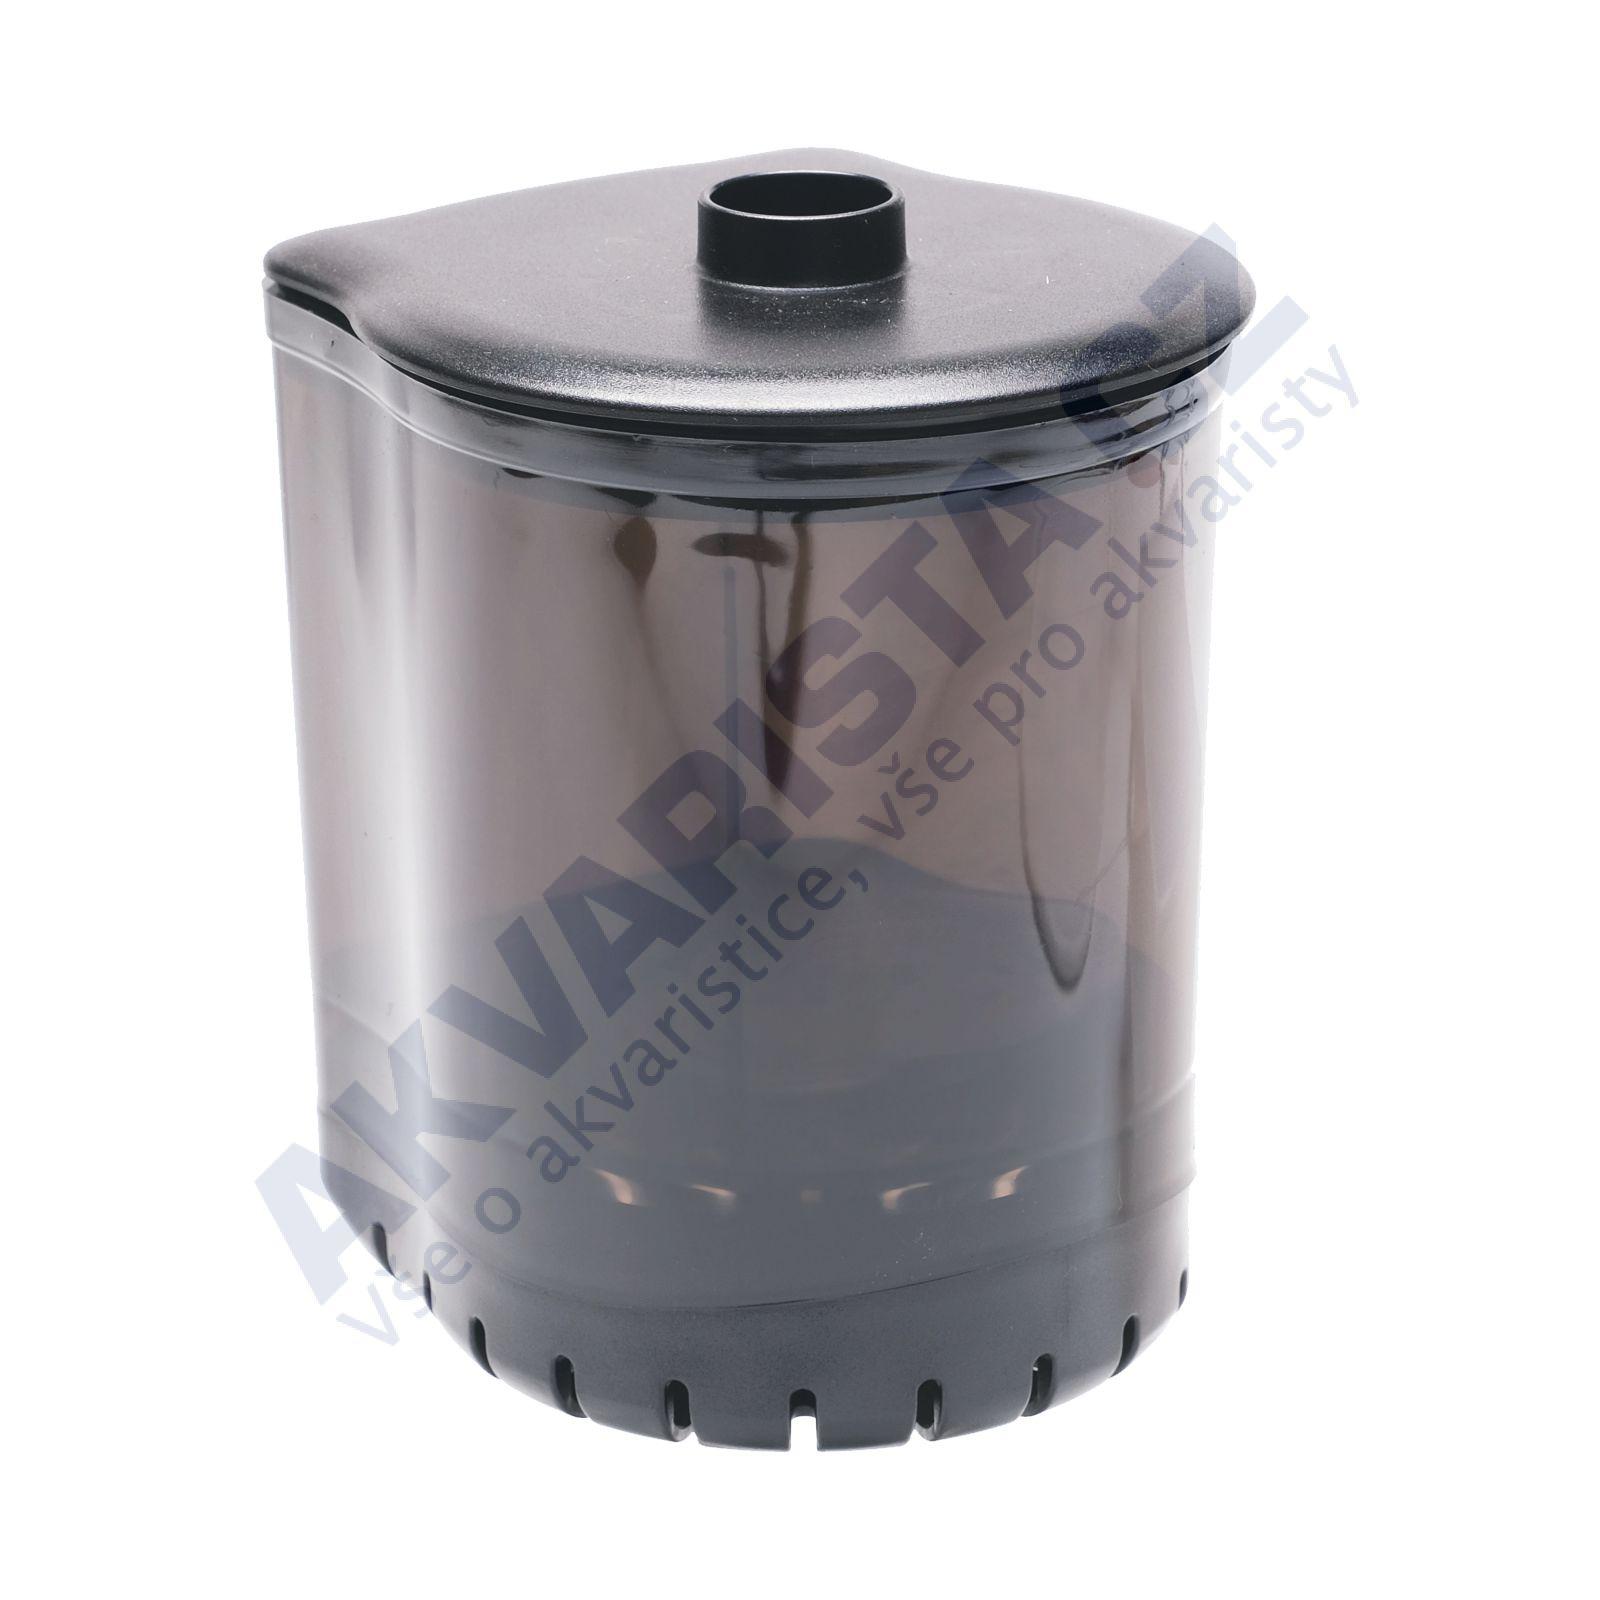 AquaEl nádobka k filtru Turbo 1000, 1500, 2000